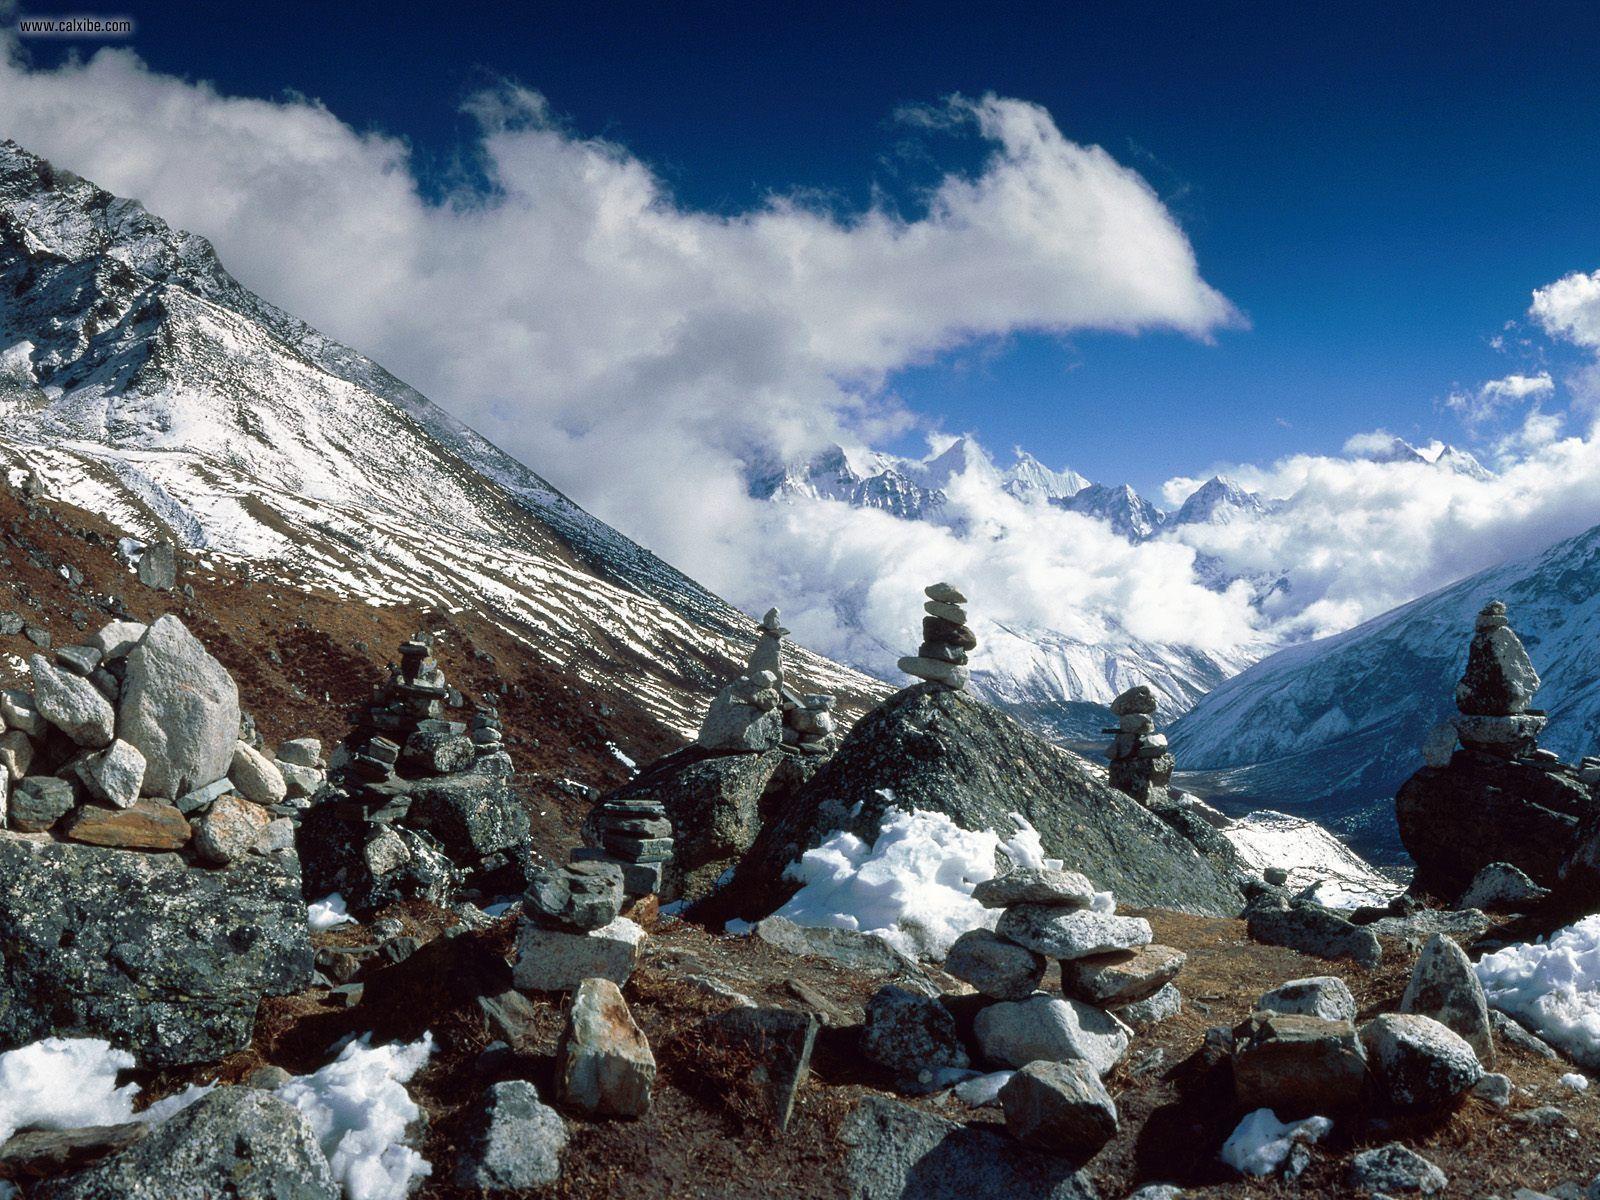 Wallpapers Of Himalayas 1600x1200